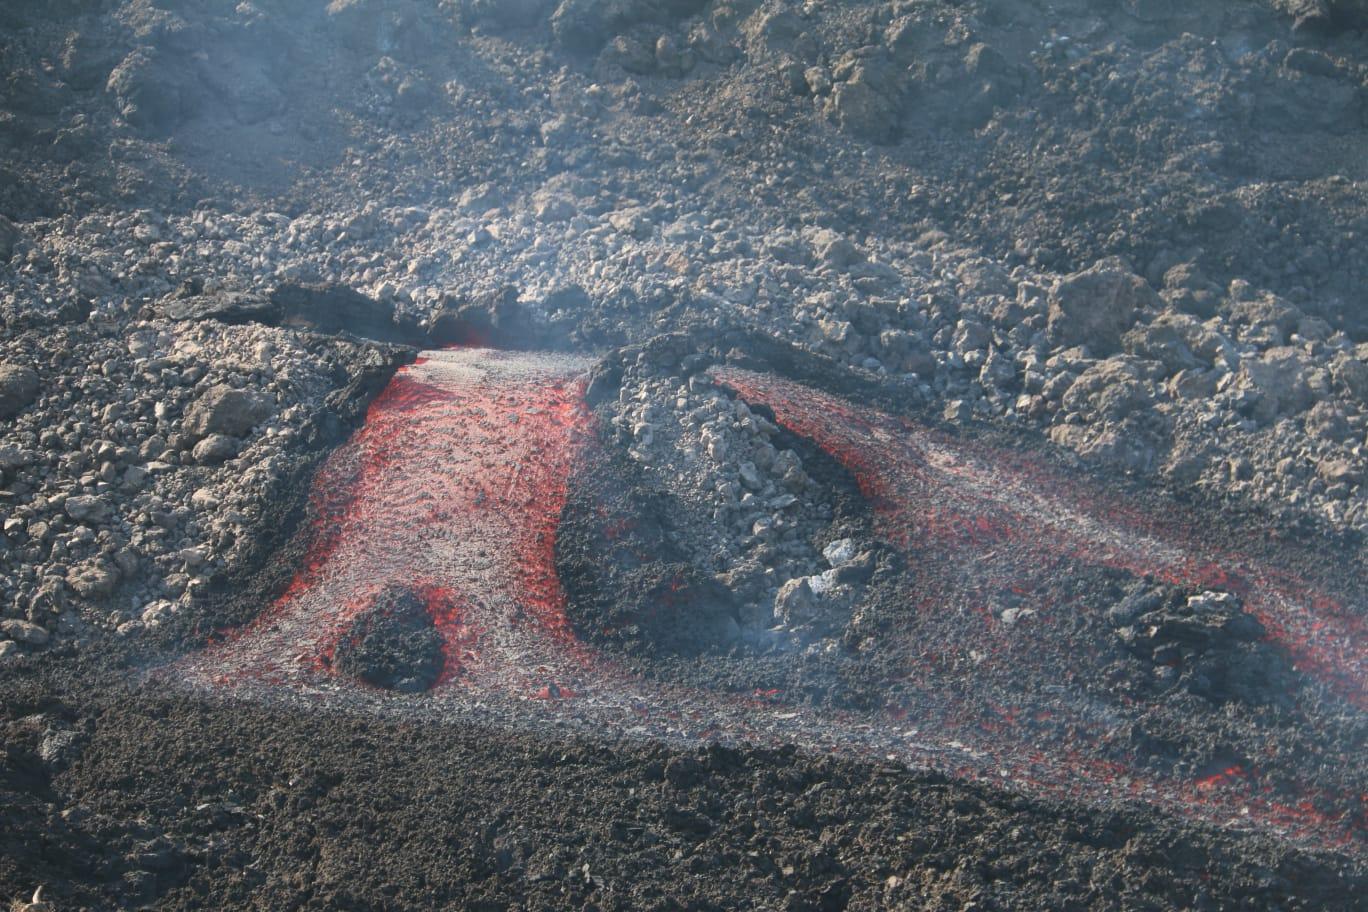 Lava tubes at Cumbre Vieja volcano (image: INVOLCAN)